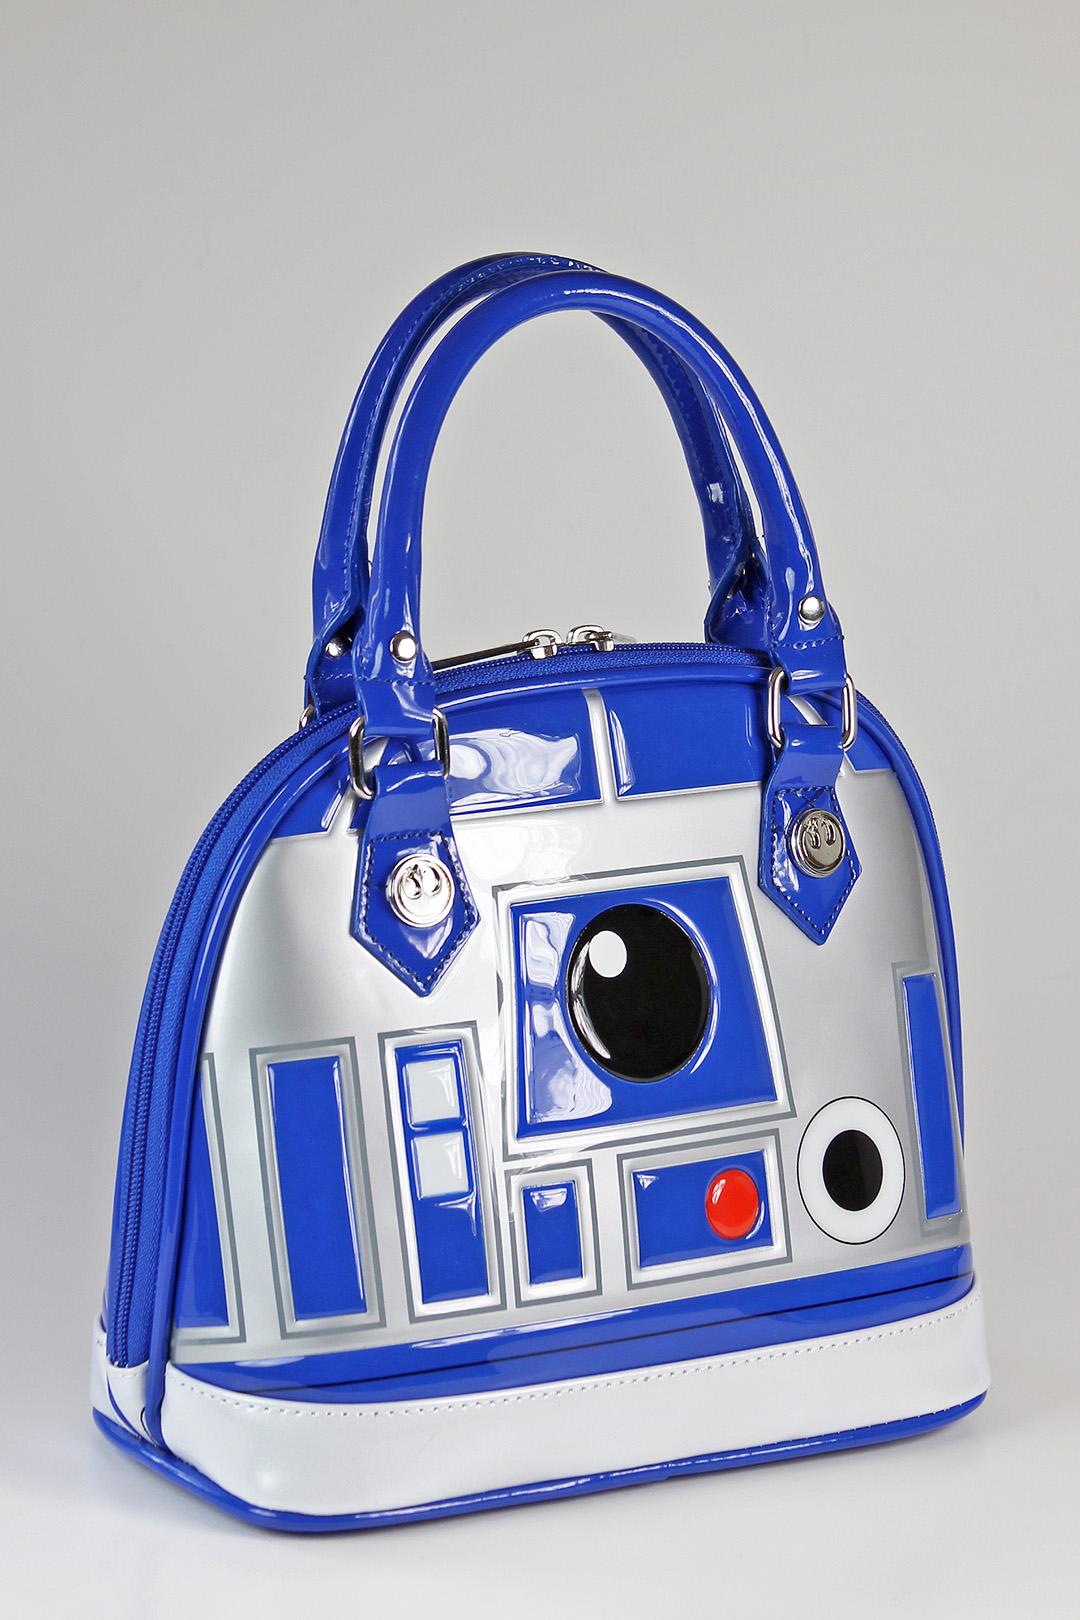 Loungefly - R2-D2 handbag (front)